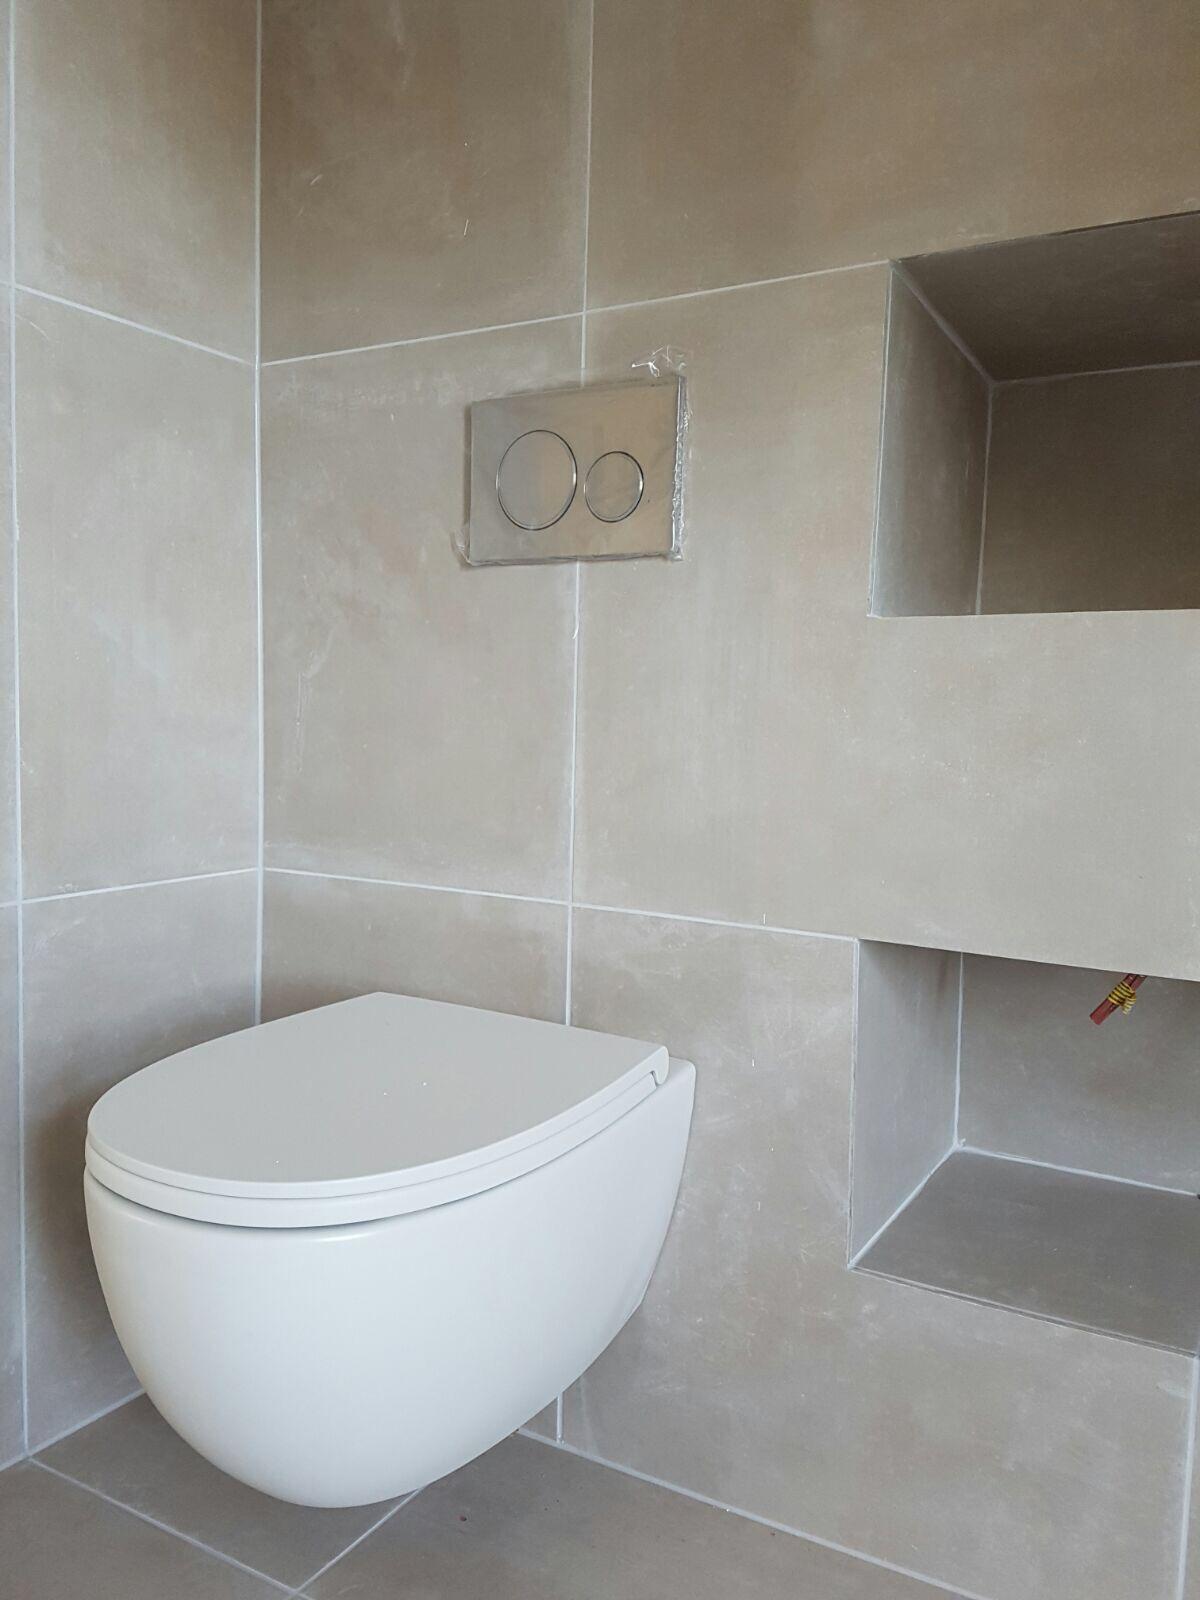 Betonlook tegels zandkleur met RVS look bedieningspaneel en wit ...